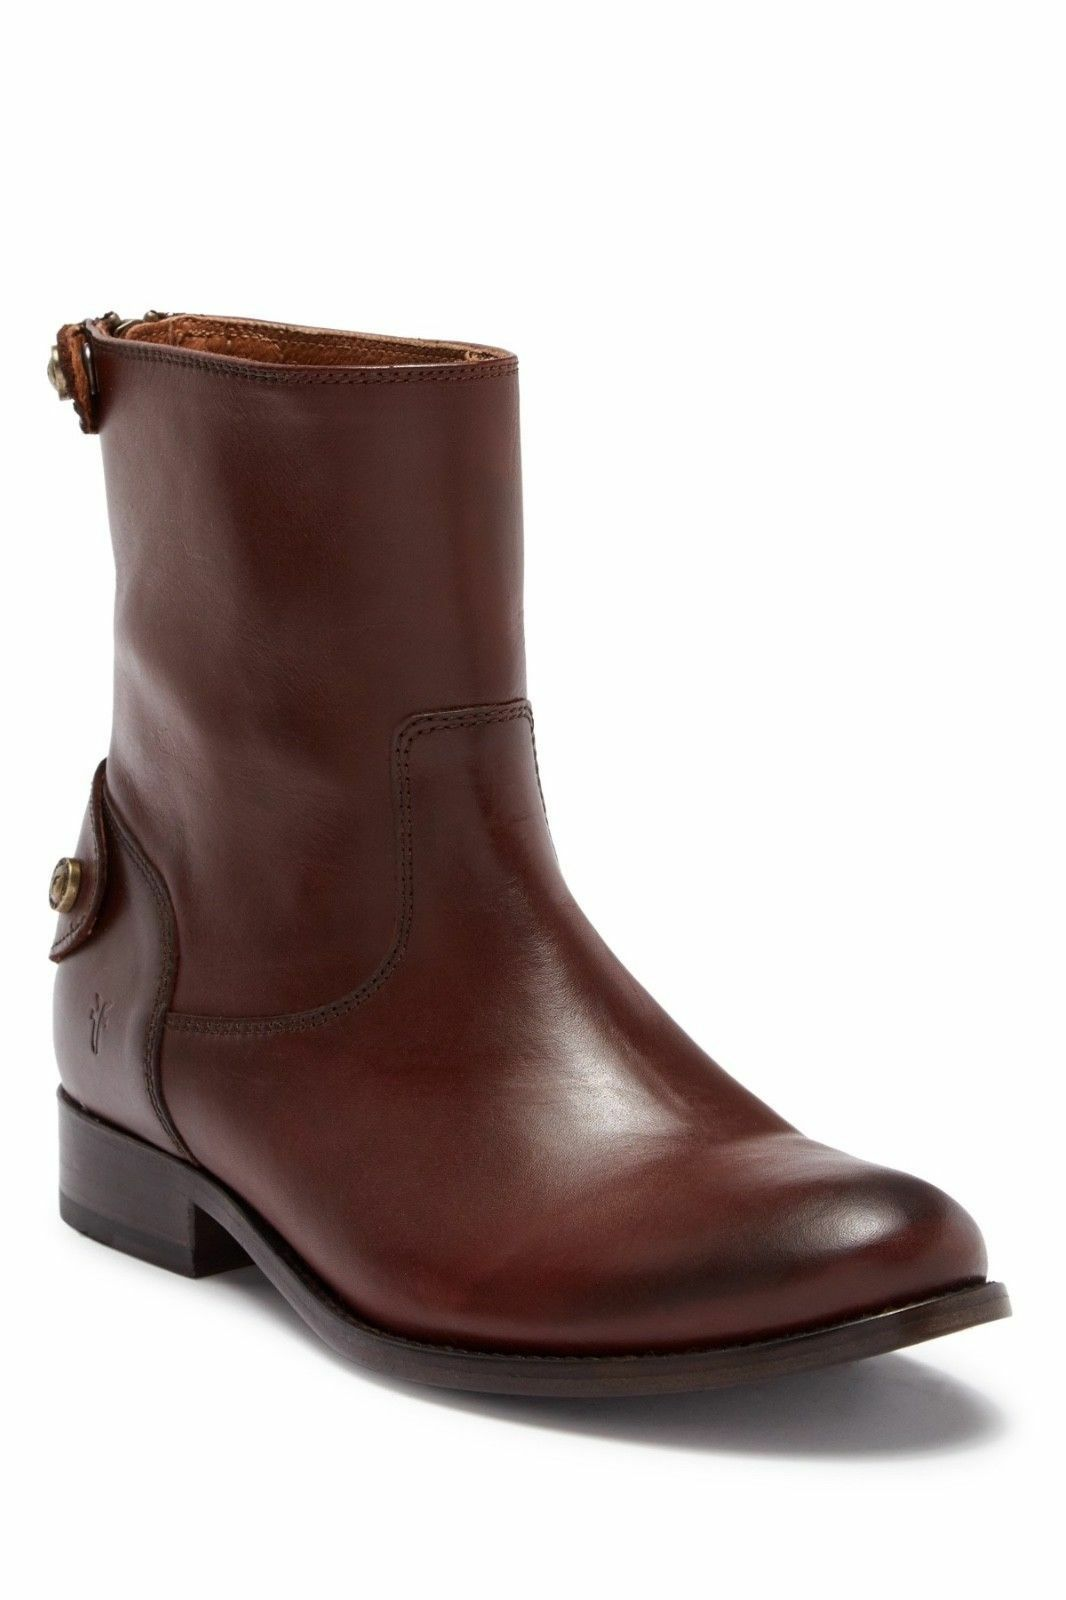 Frye Melissa Melissa Melissa Button Back Zip Short Boots Sz 7 Cognac New 3920e2